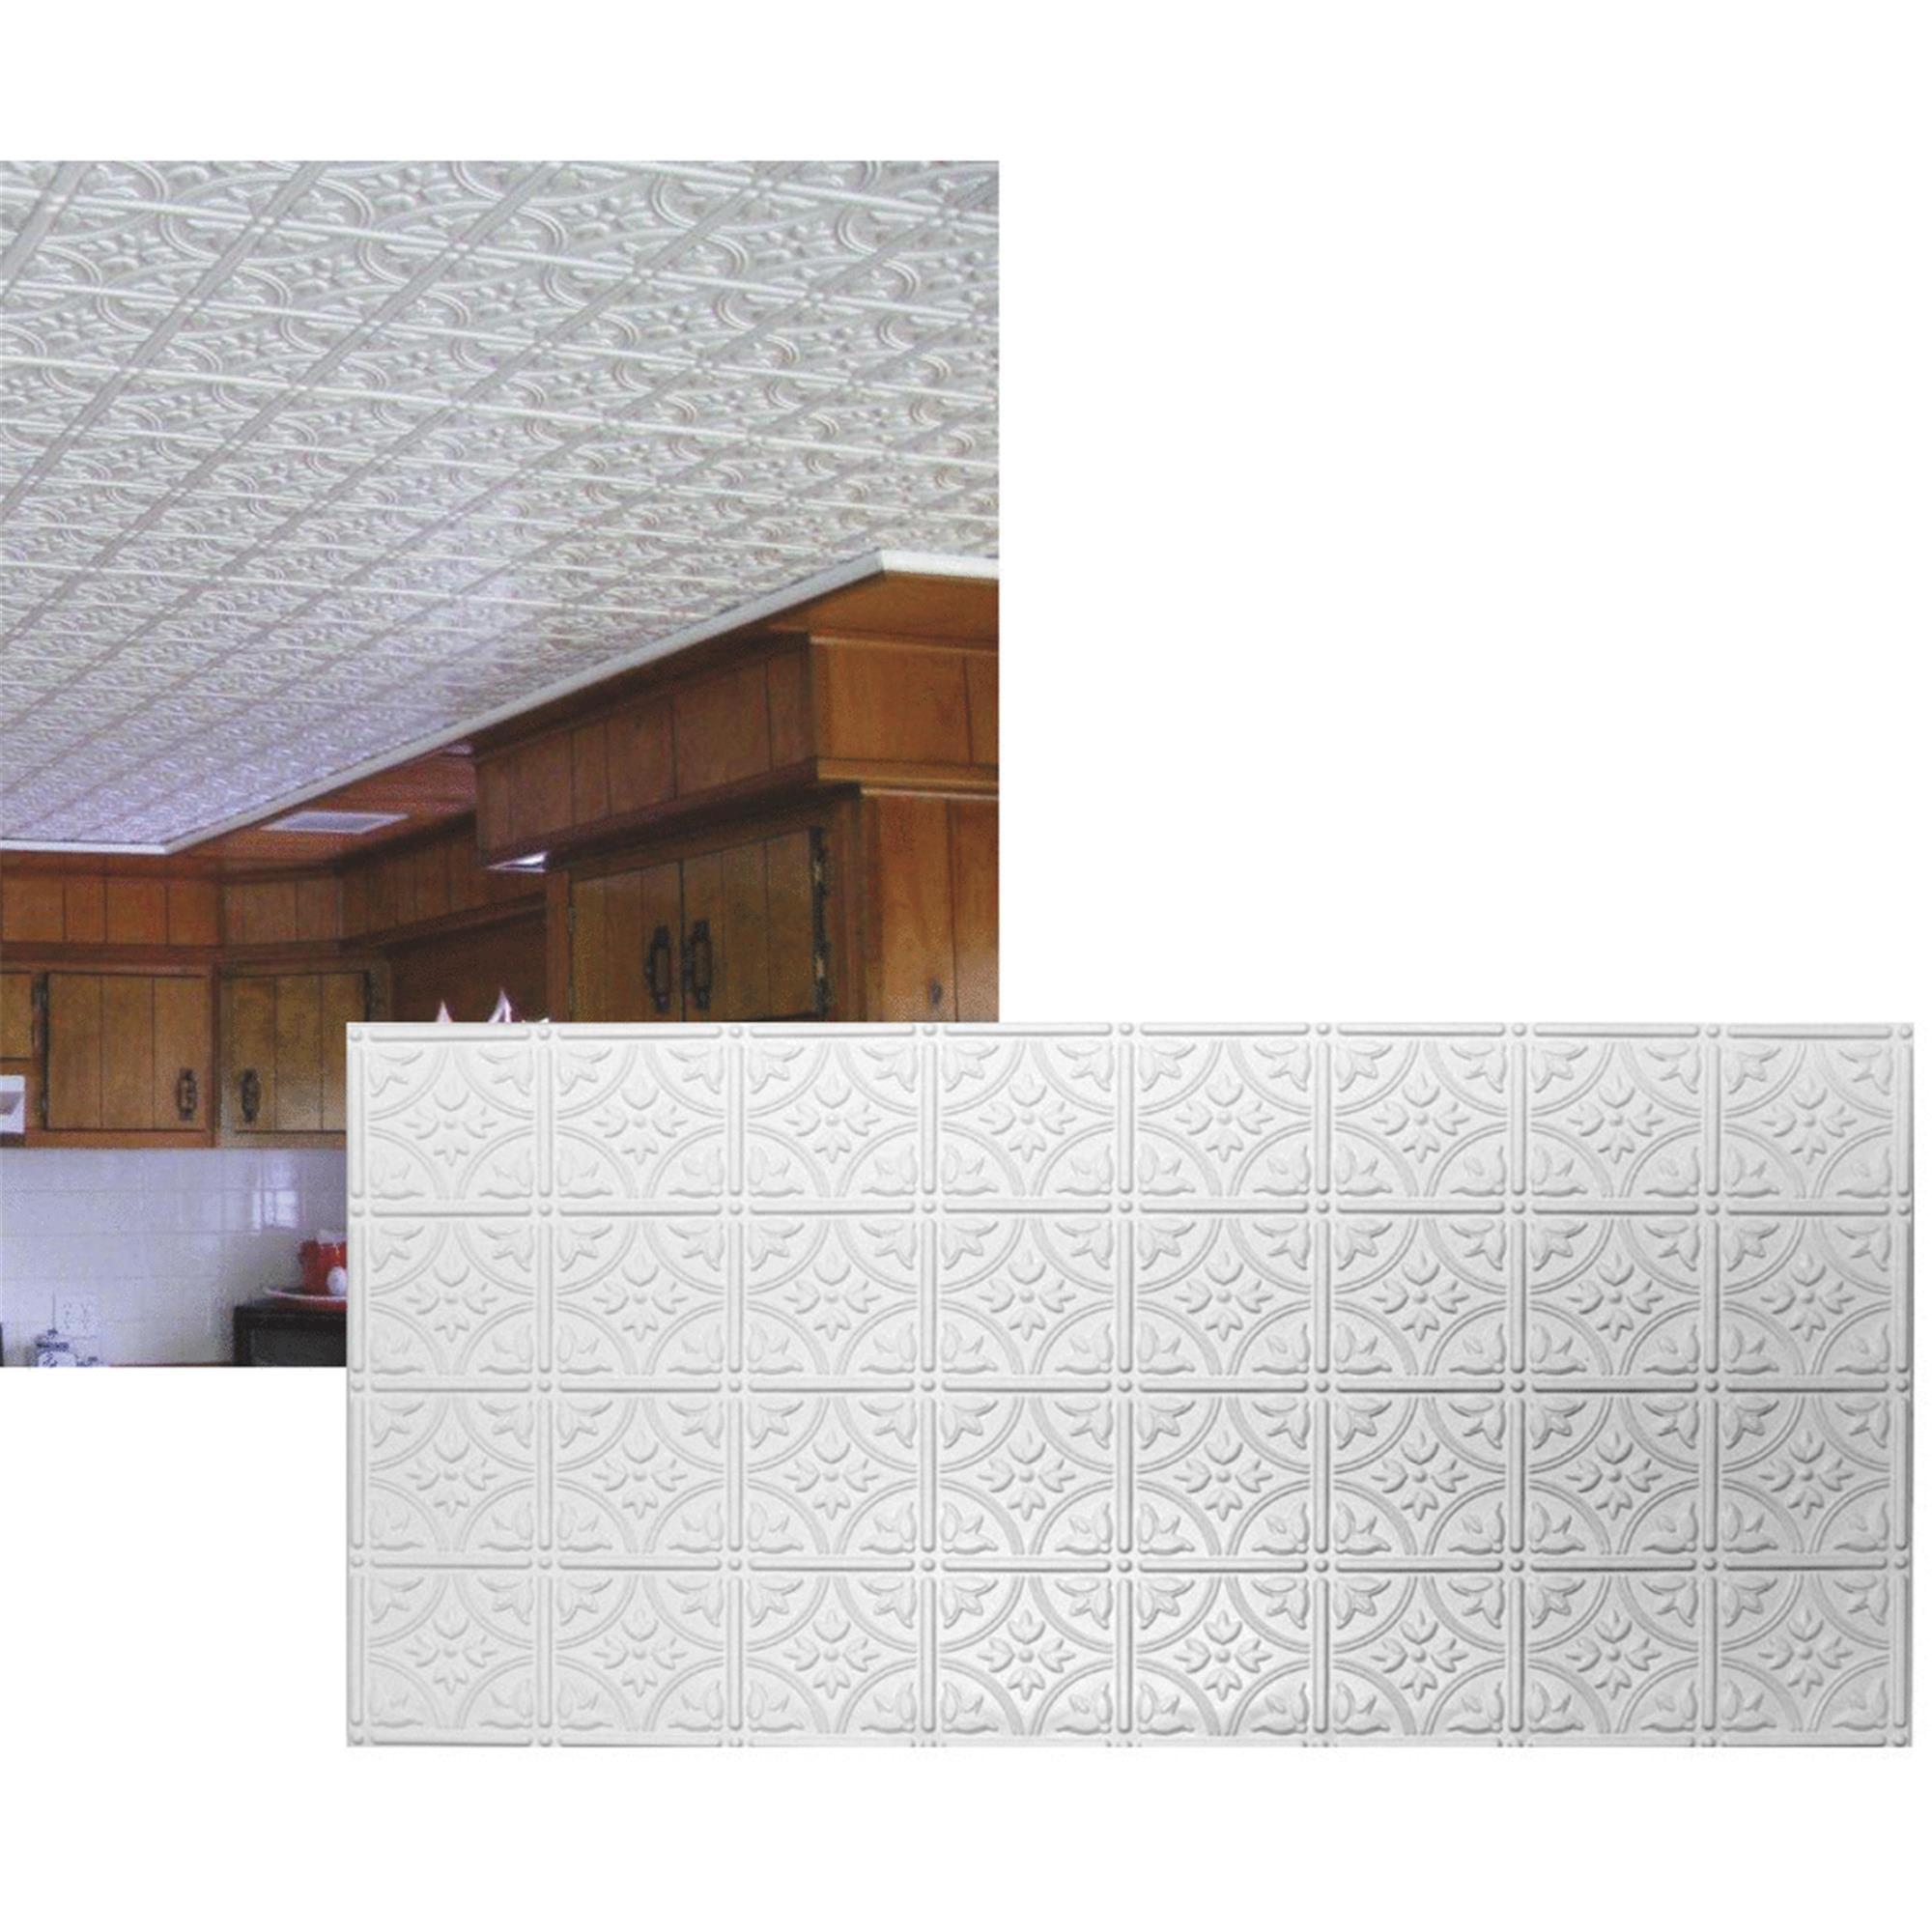 Dimensions Tin Look Nonsuspended Ceiling Tile & Backsplash - Walmart.com